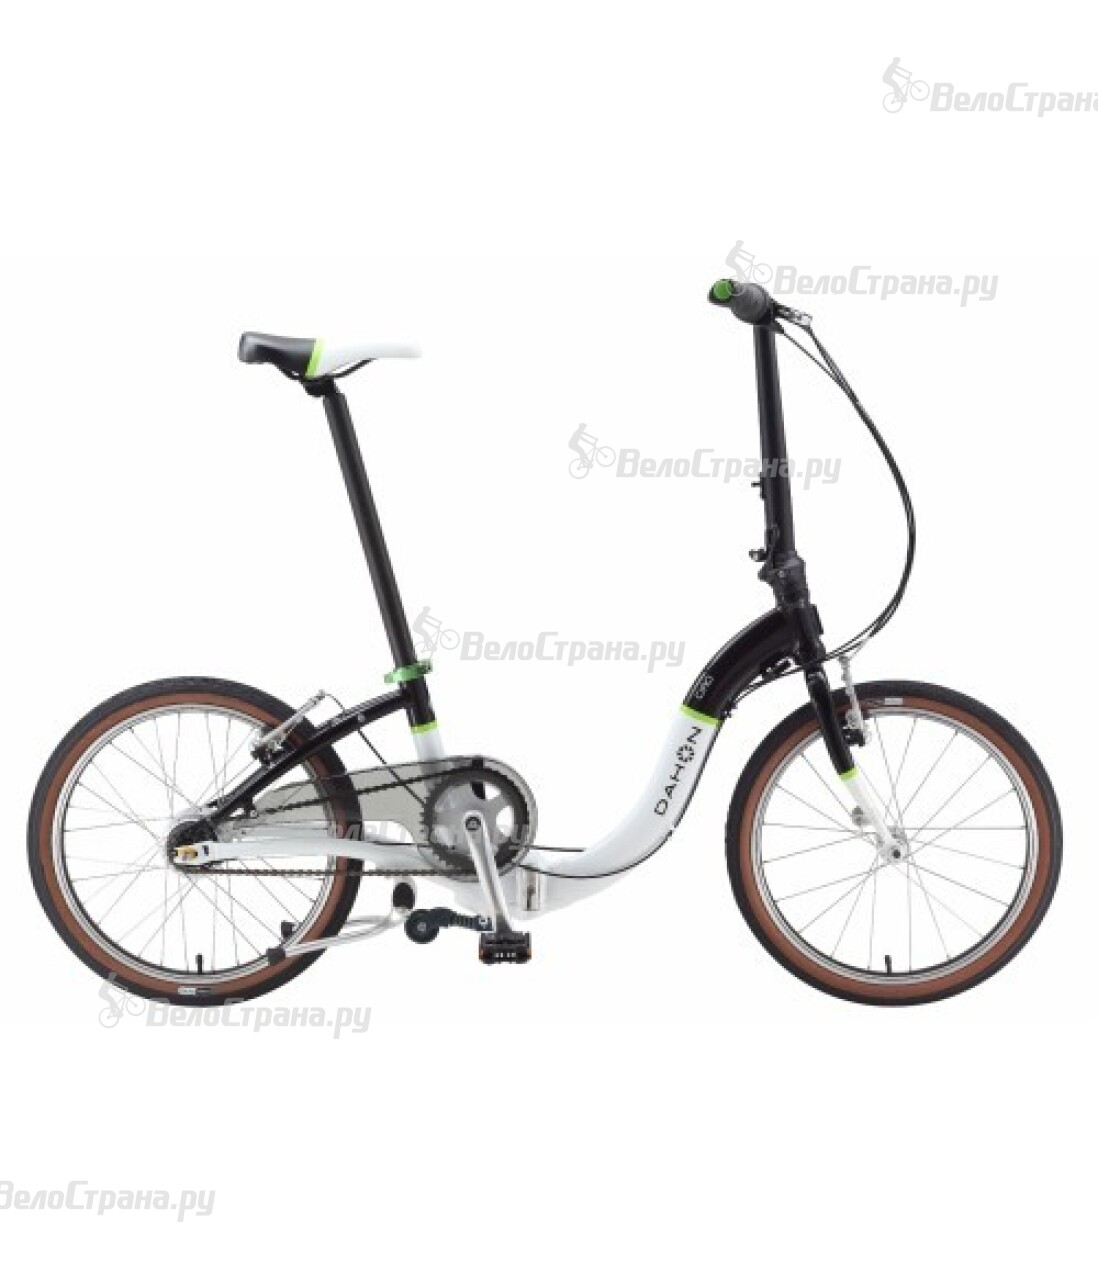 Велосипед Dahon Ciao D7 (2015) велосипед dahon speed d7 2014